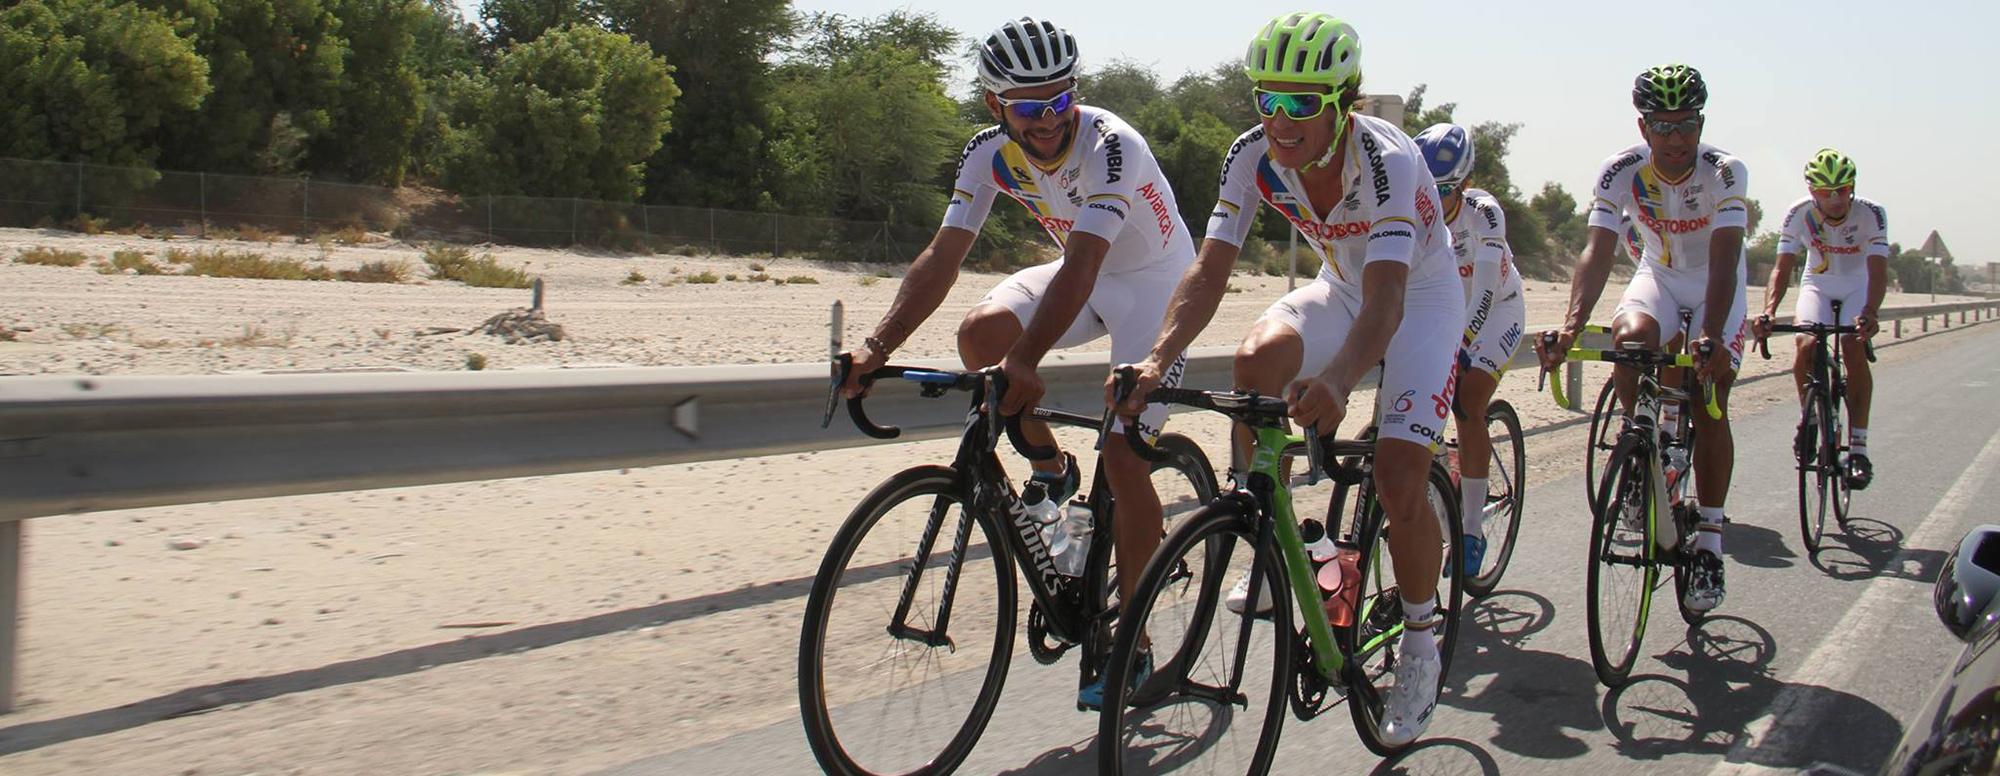 ciclismo-mundial-de-ruta